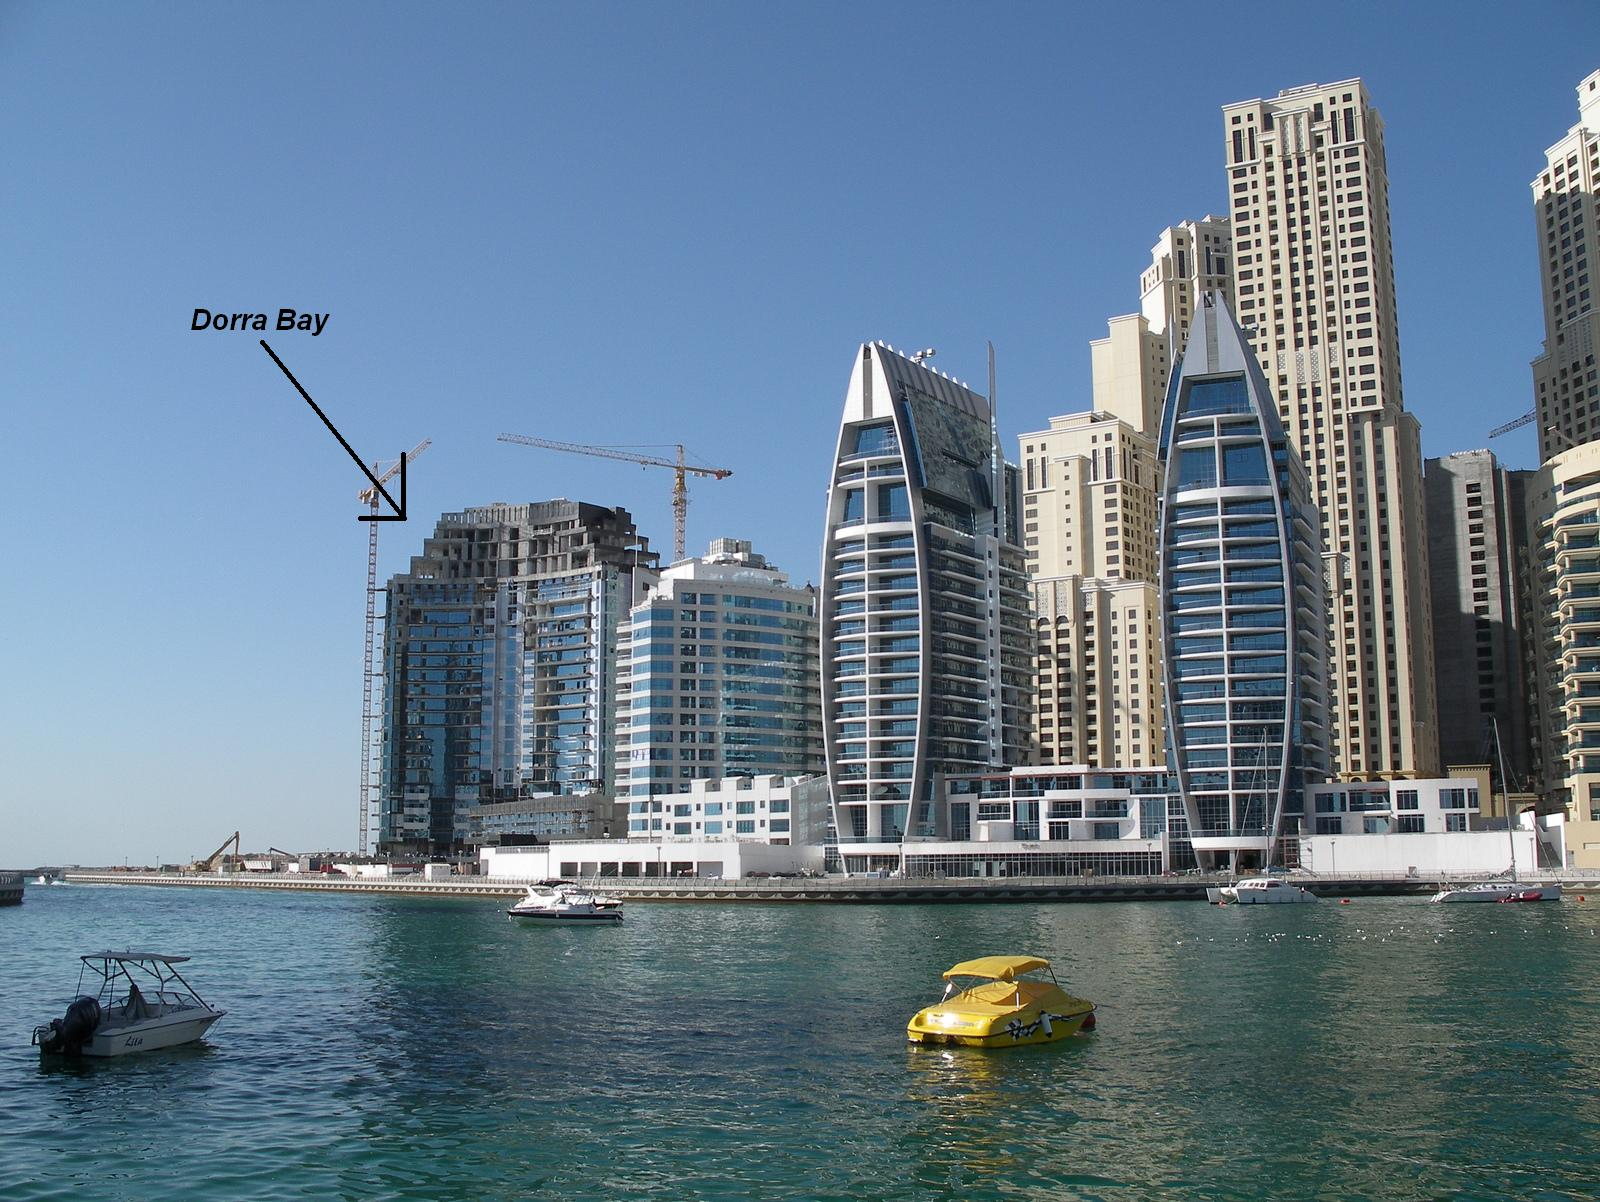 10 26 2017 4 13 Pm 83861 Dubai Marina Dorra Bay Apartment Apartments Villa Villas 6 Jpg